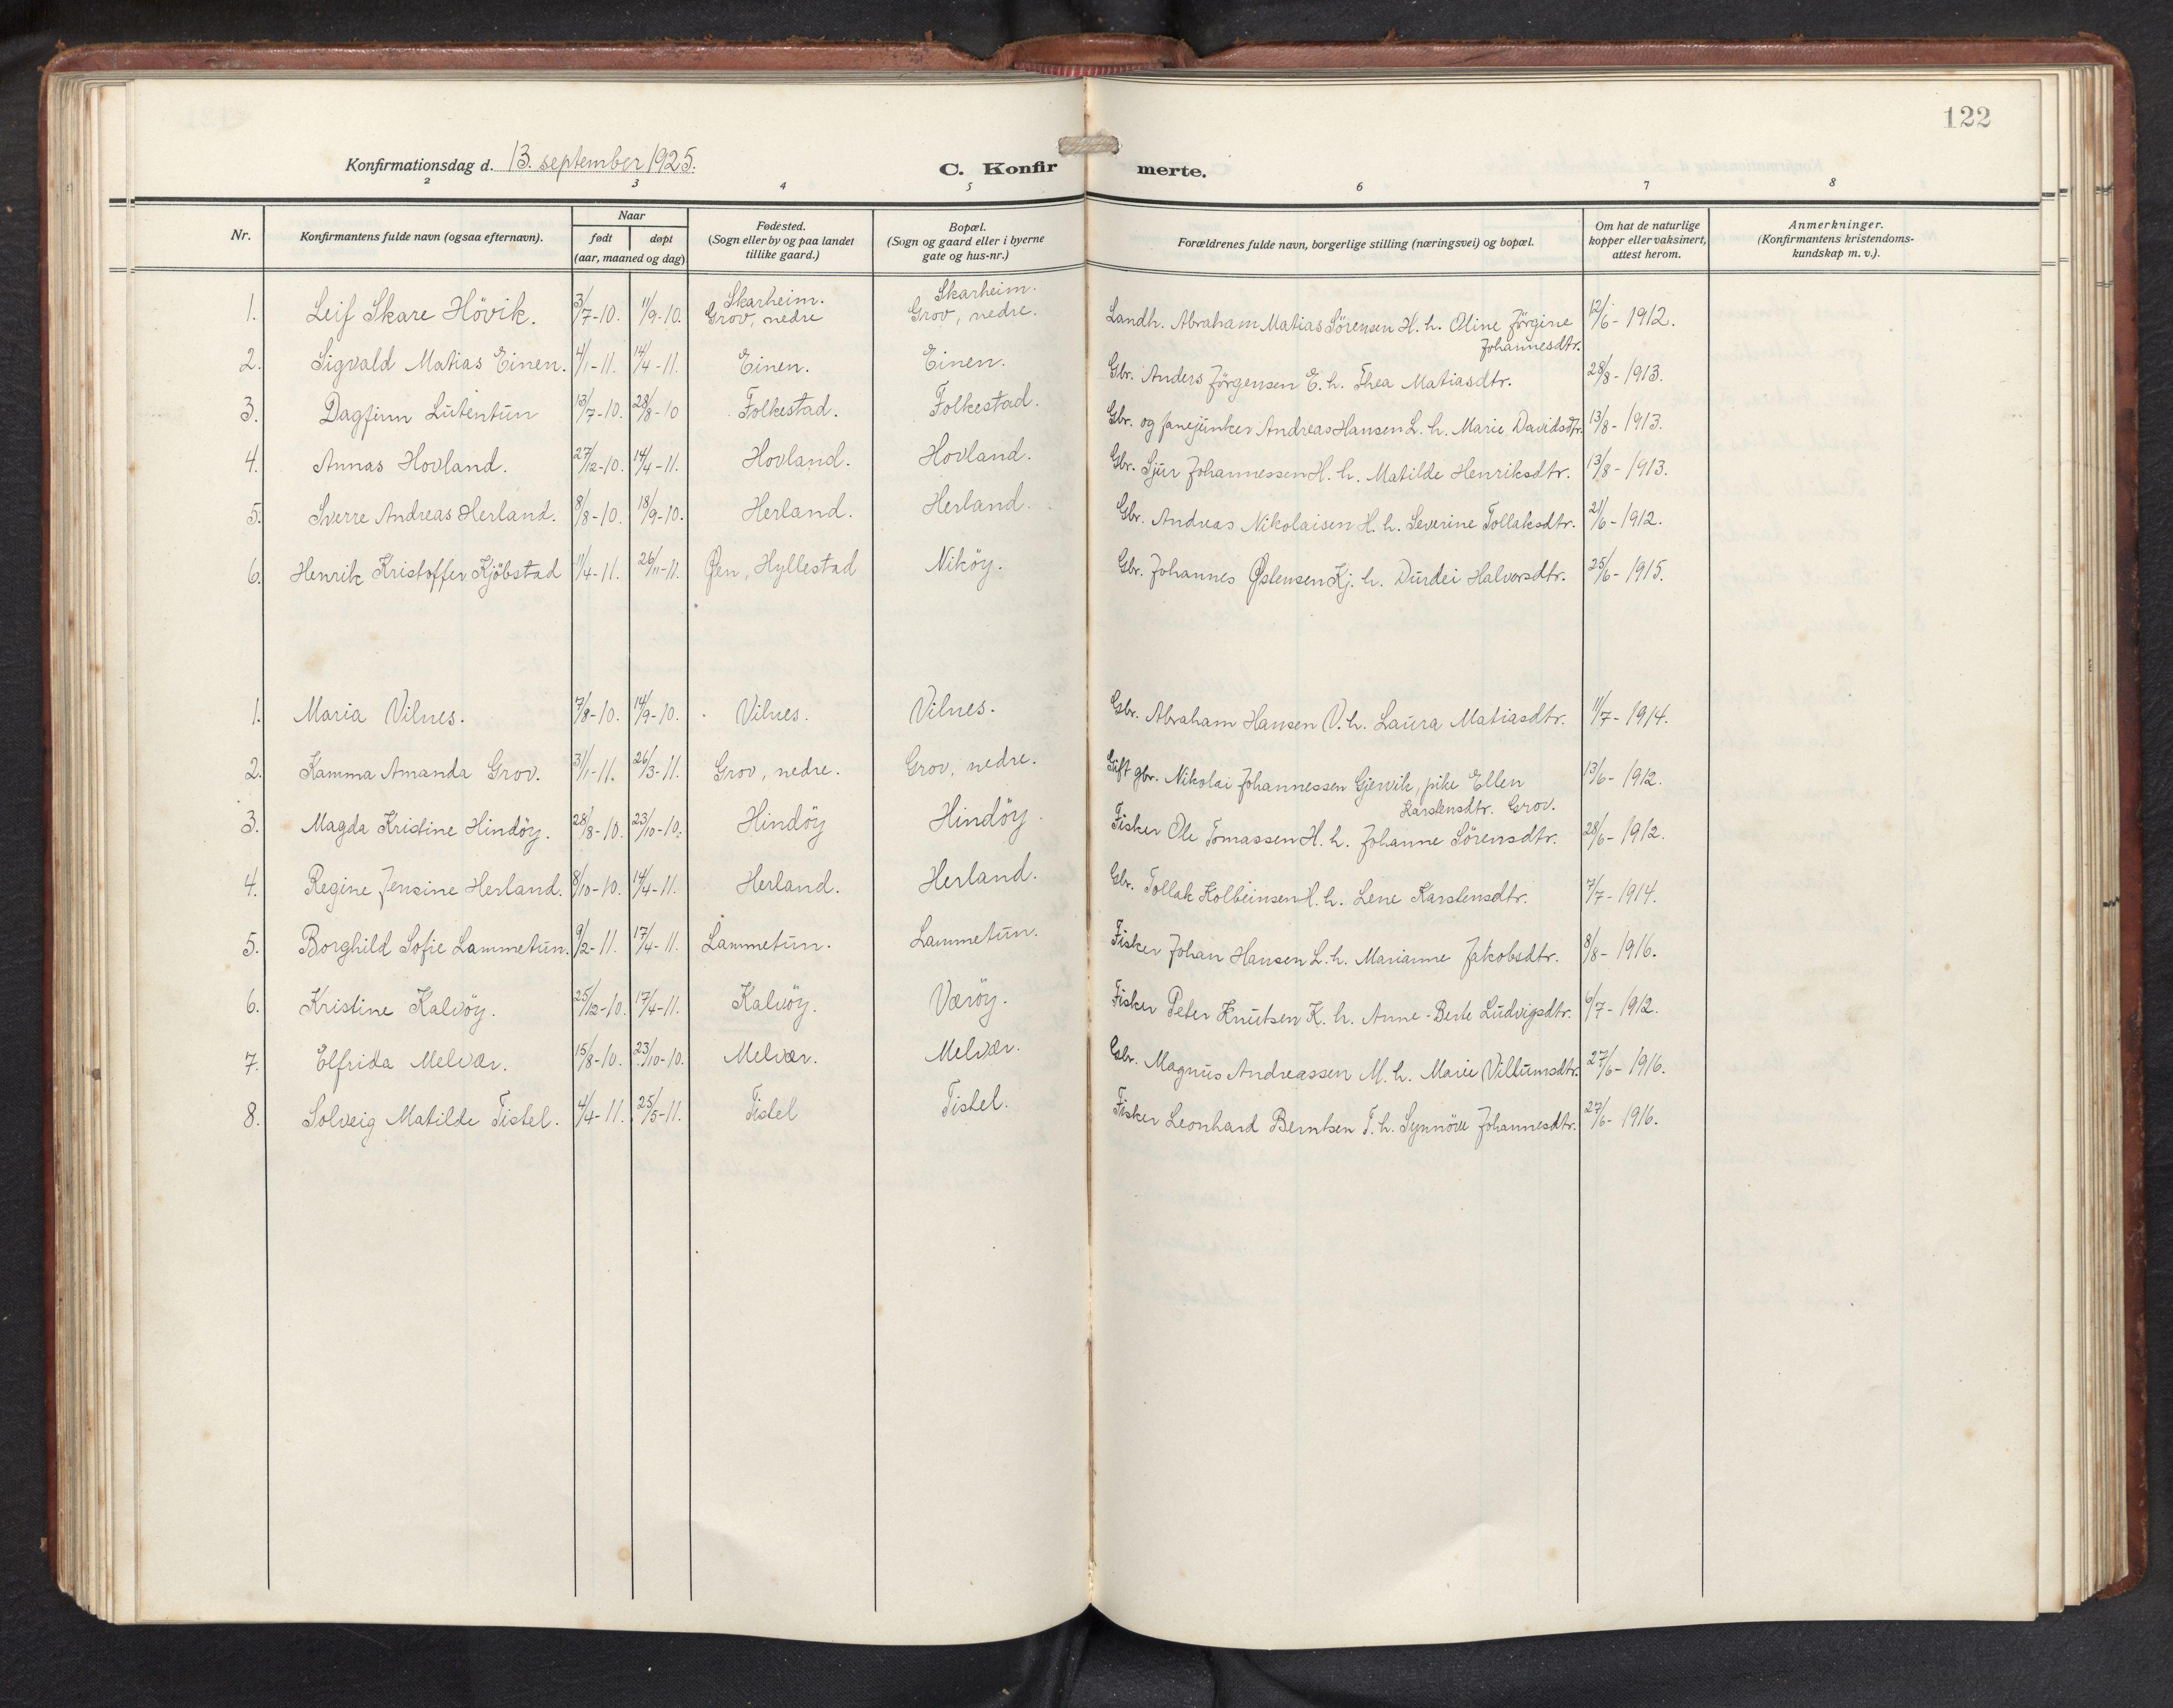 SAB, Askvoll sokneprestembete, H/Hab/Habb/L0002: Klokkerbok nr. B 2, 1910-1947, s. 121b-122a